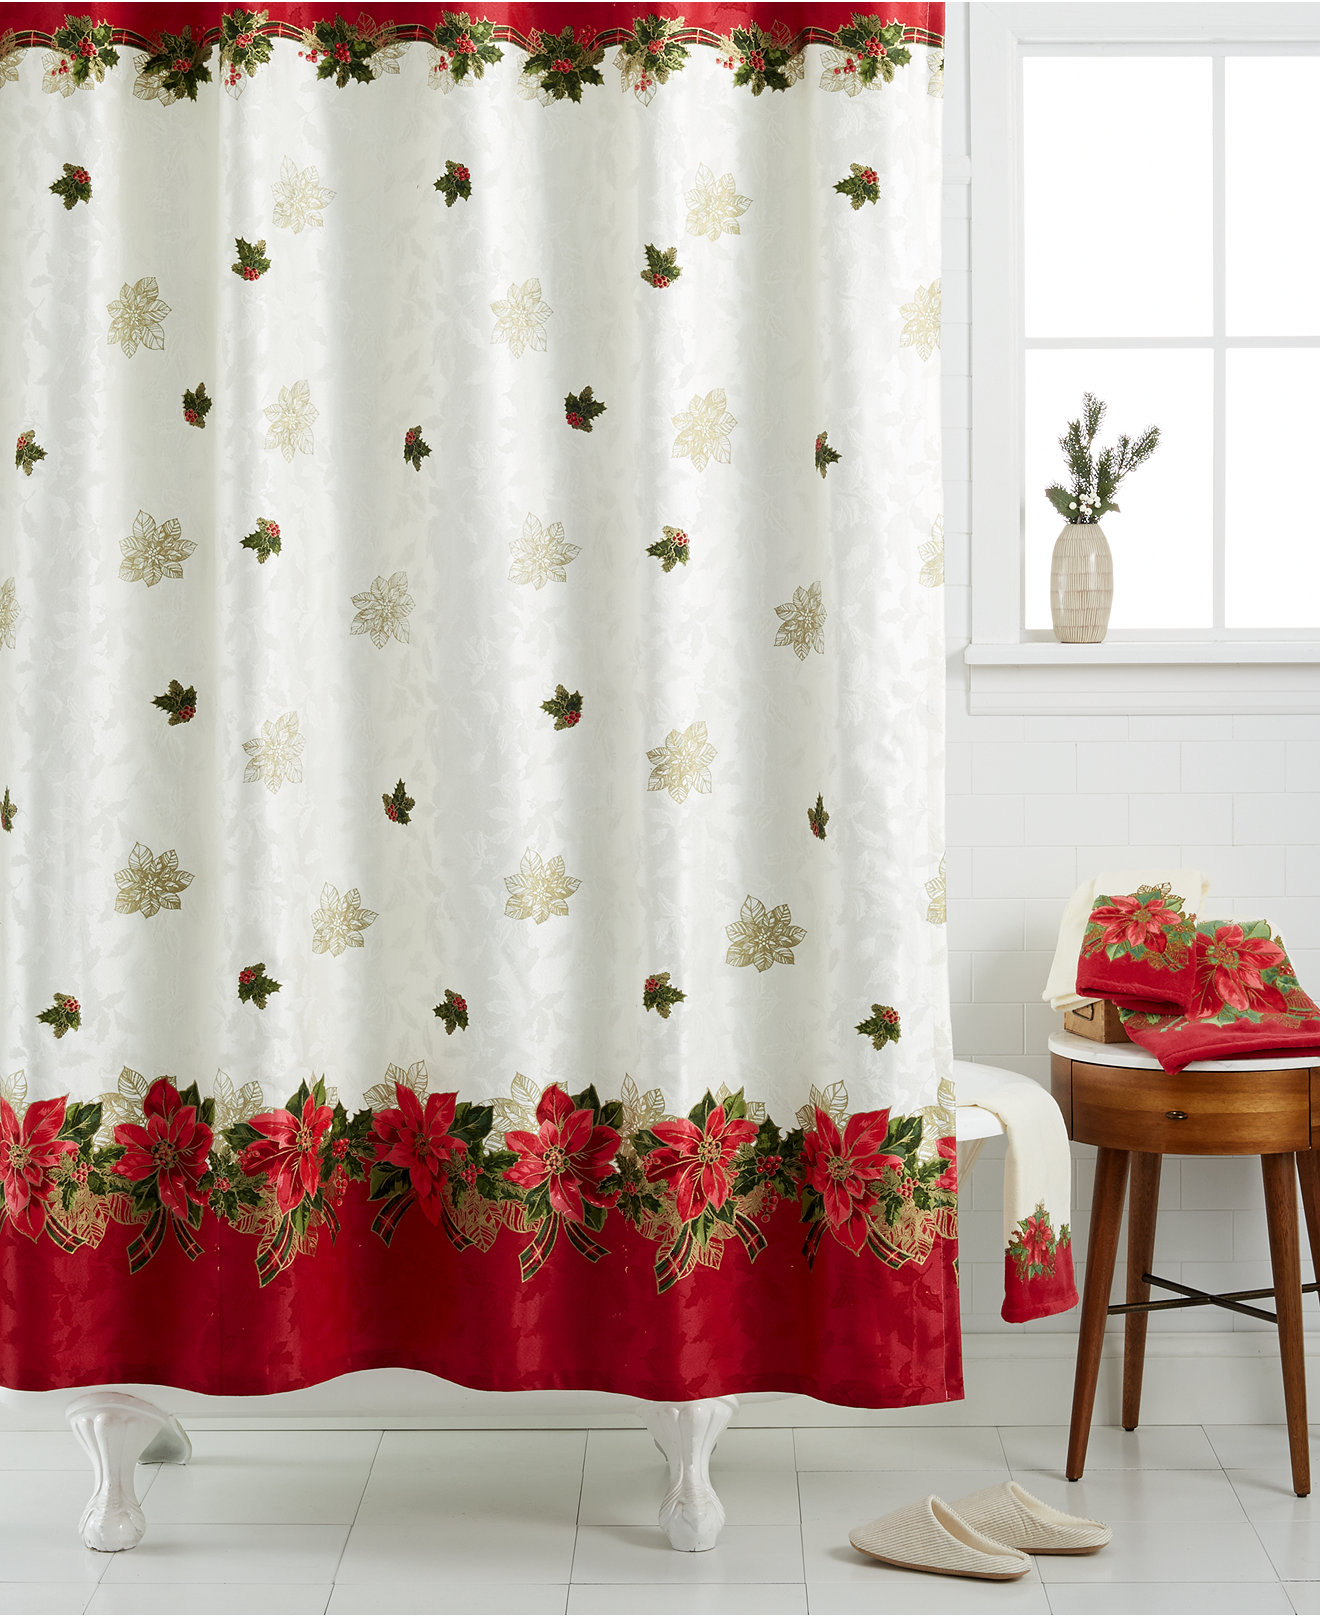 20 Christmas Shower Curtains Decorations Ideas 2019 UK